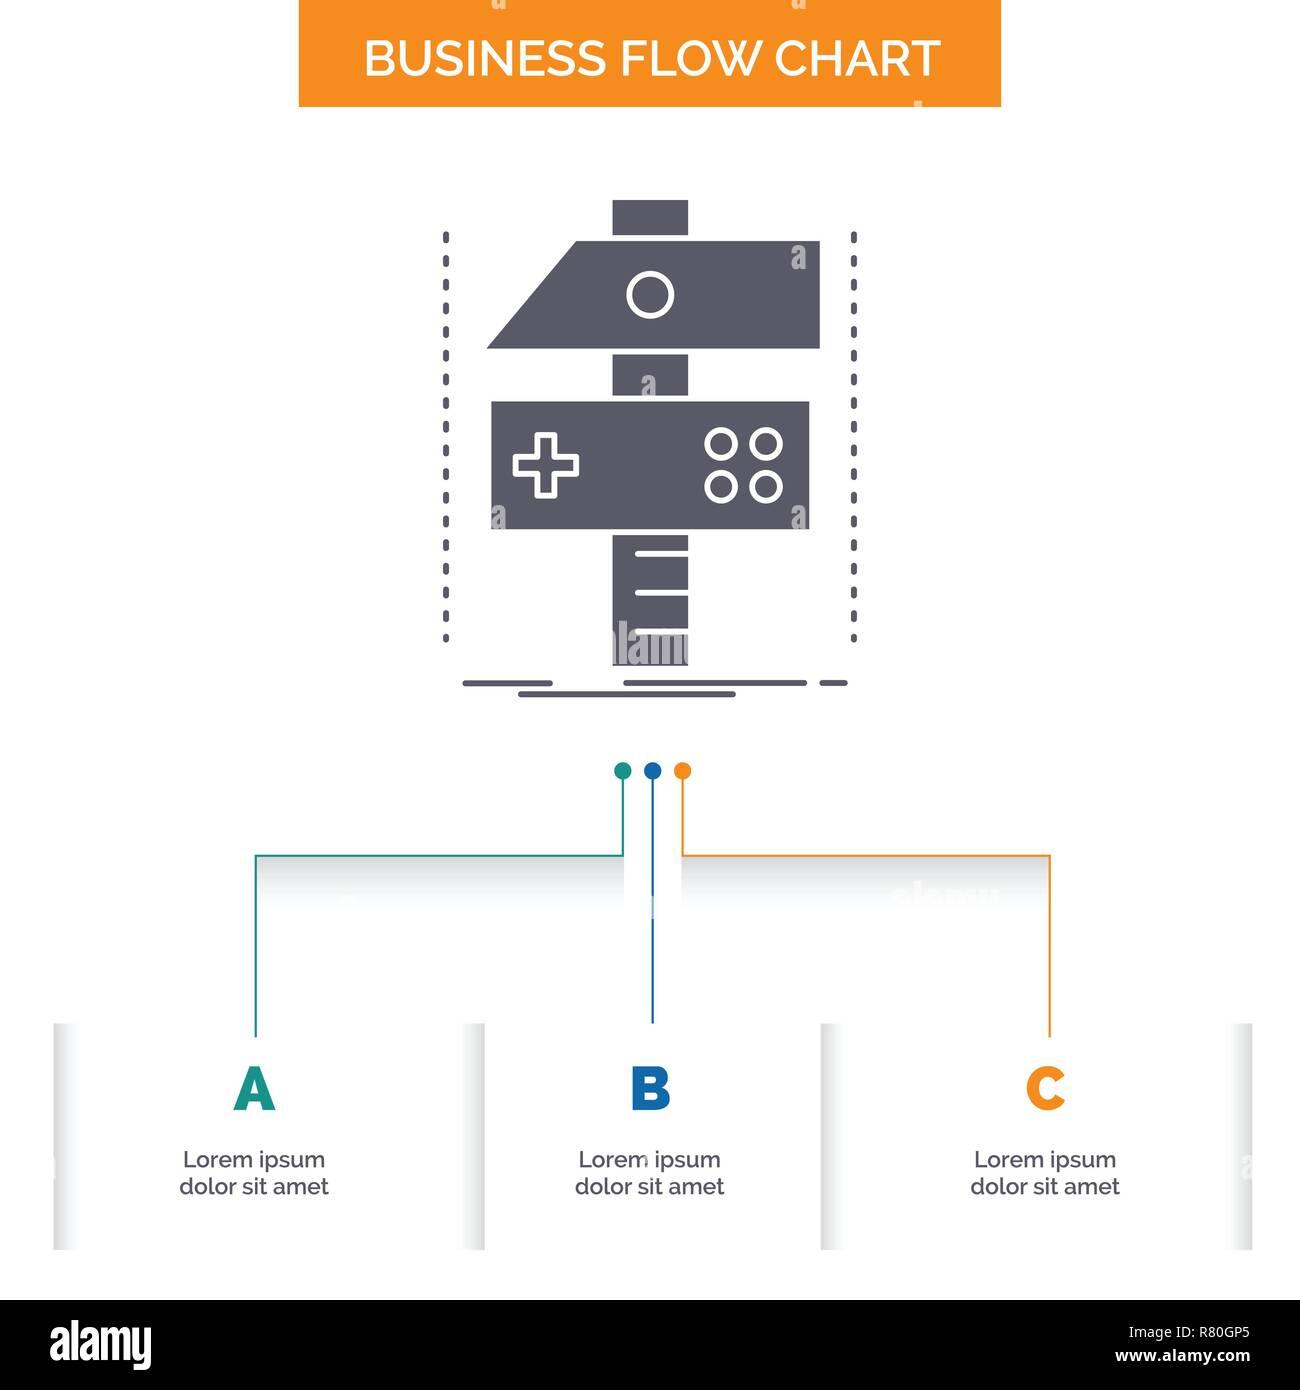 Build Craft Develop Developer Game Business Flow Chart Design